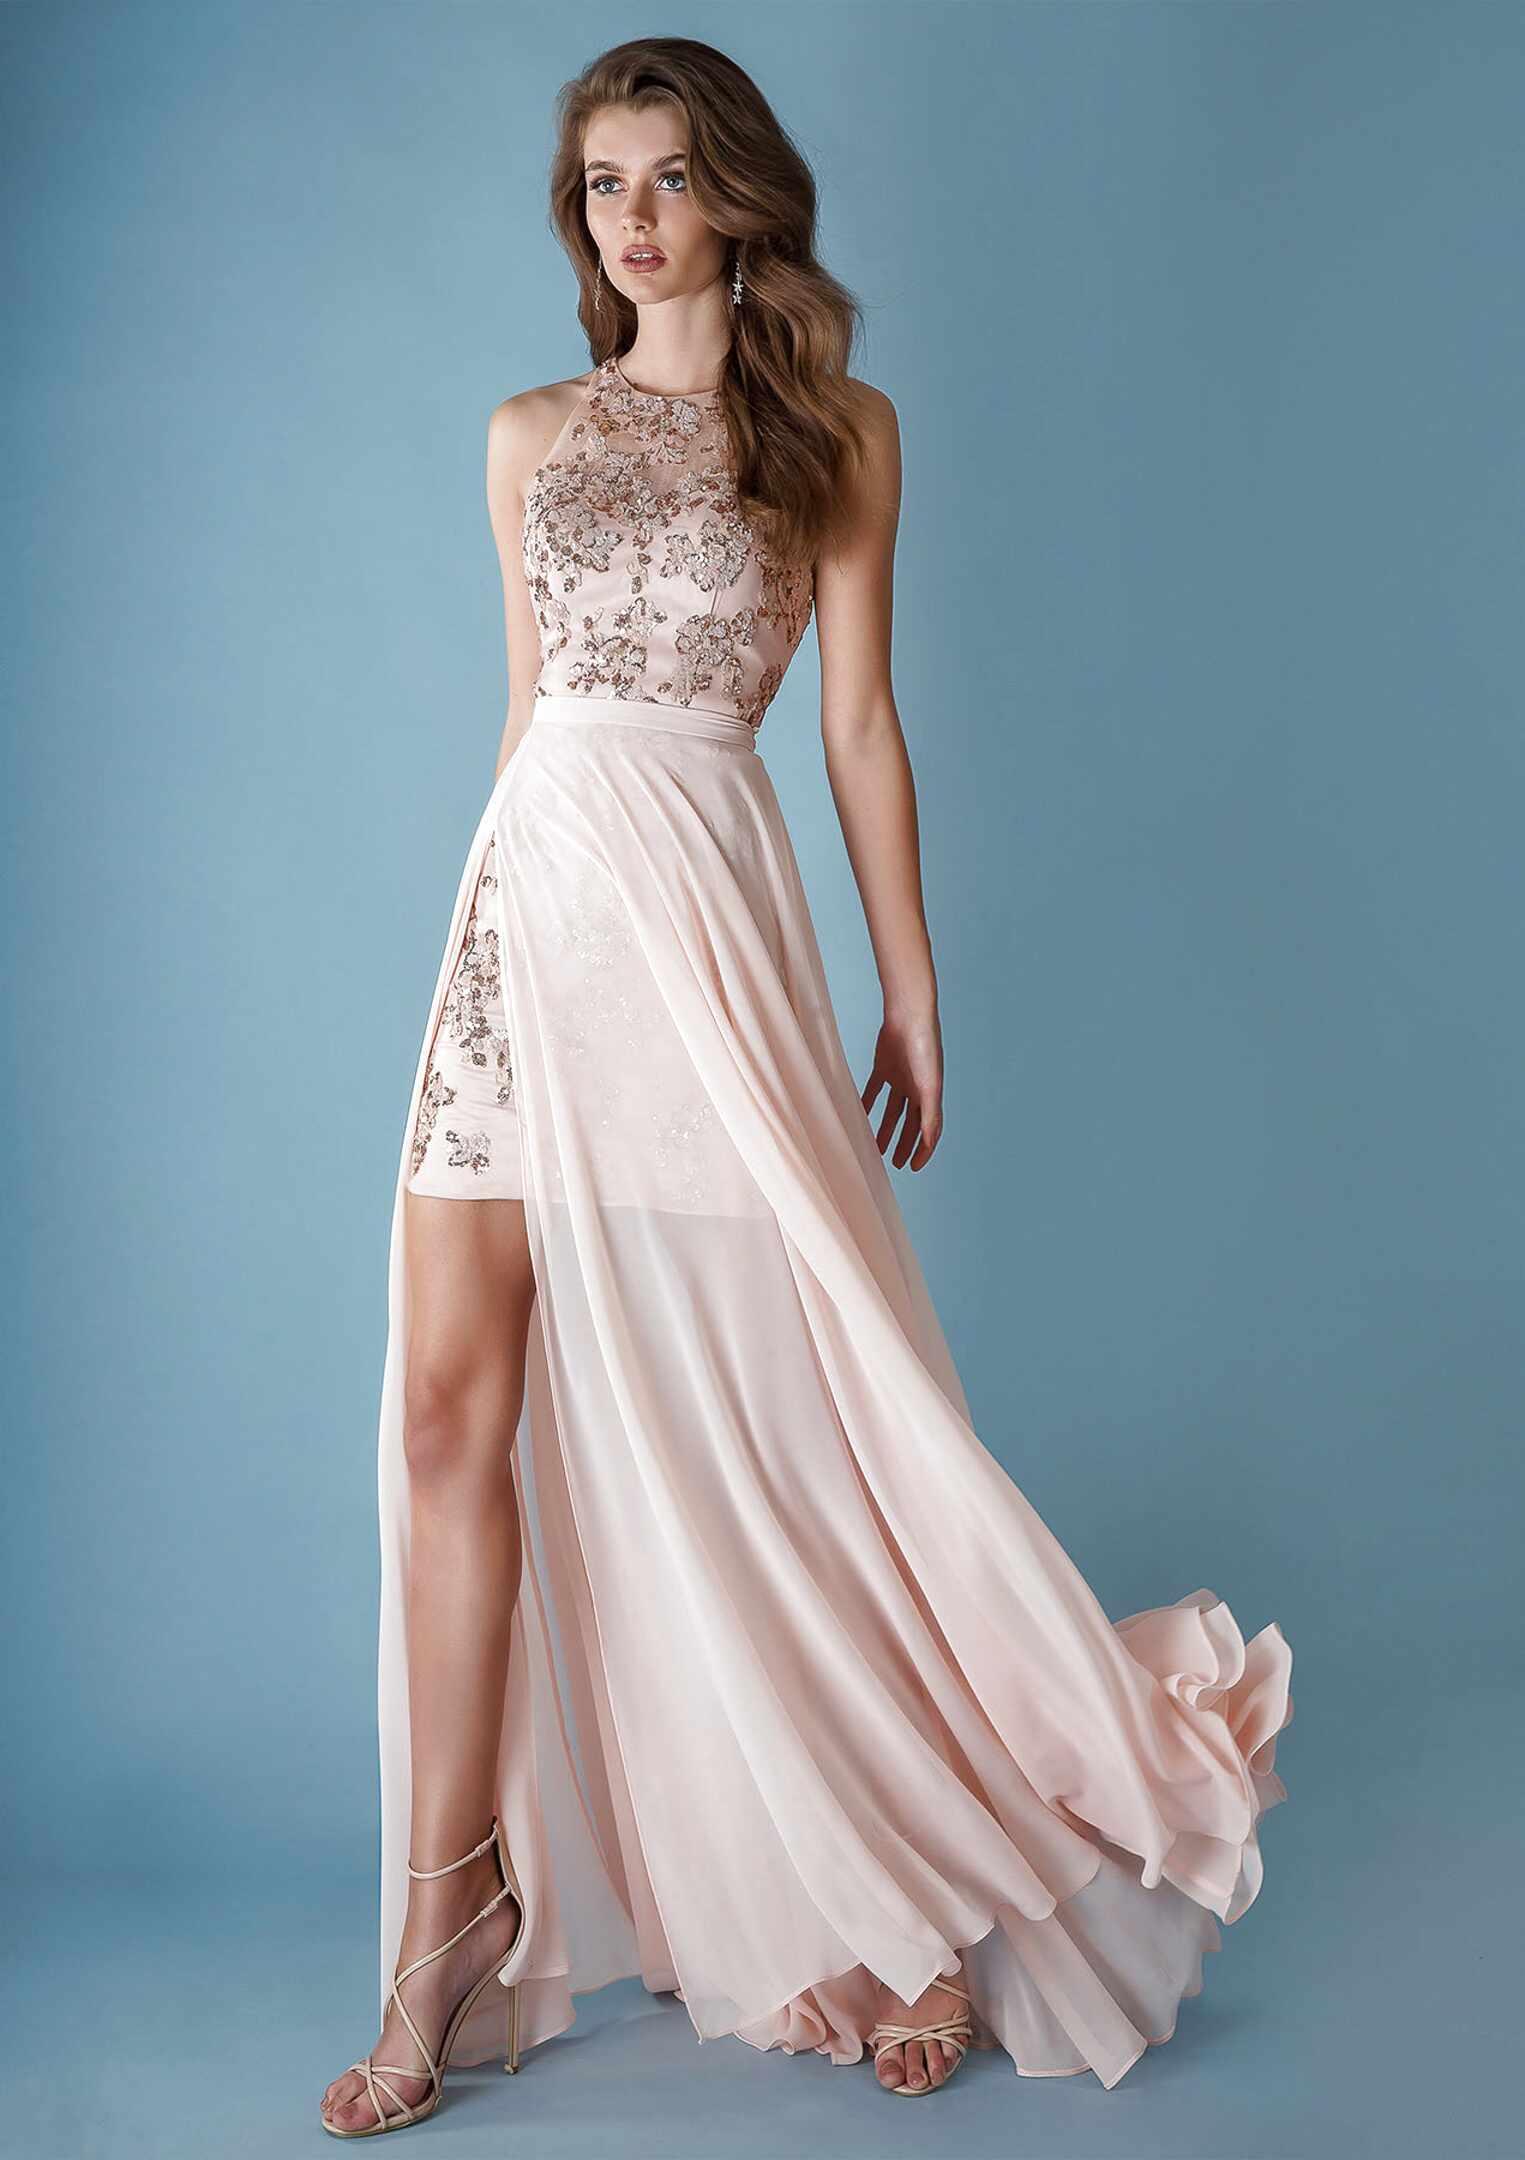 Vestiti Cerimonia Italia.Vestiti Eleganti Donna Cerimonia Usato In Italia Vedi Tutte I 40